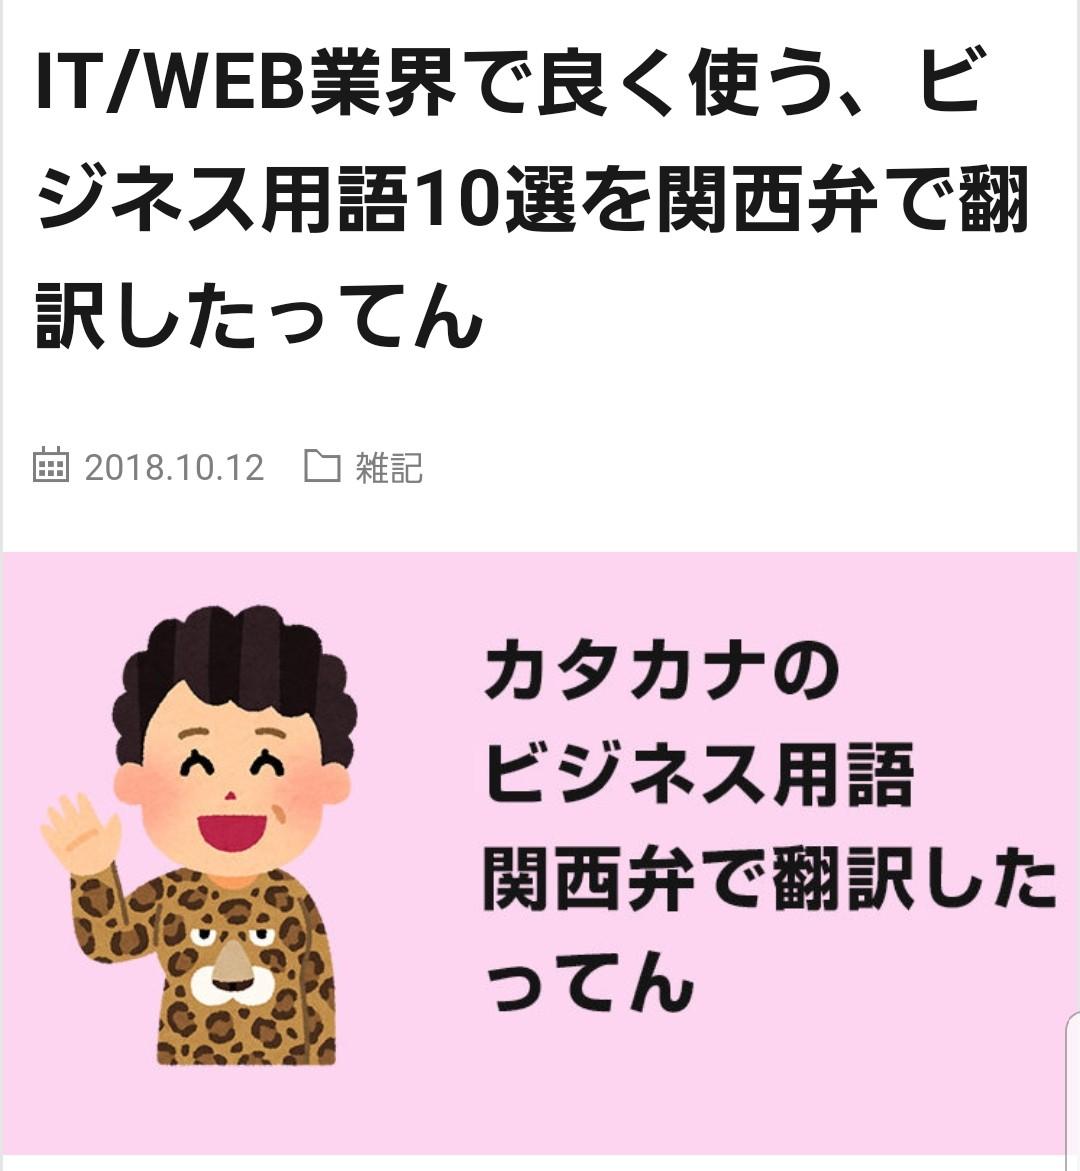 IT関係,WEB業界,ビジネス用語,ネット,関西弁で翻訳,超おもしろい